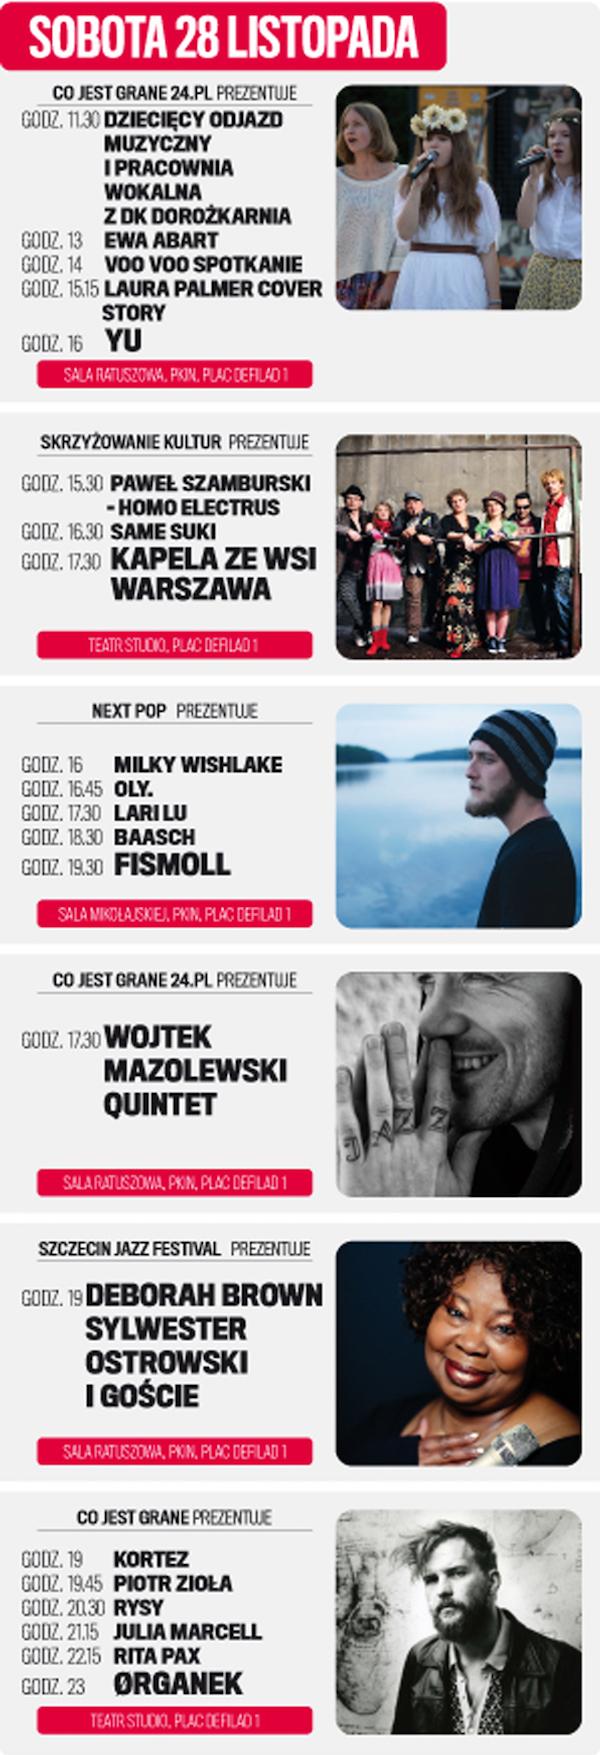 cjg2015-koncerty-sobota